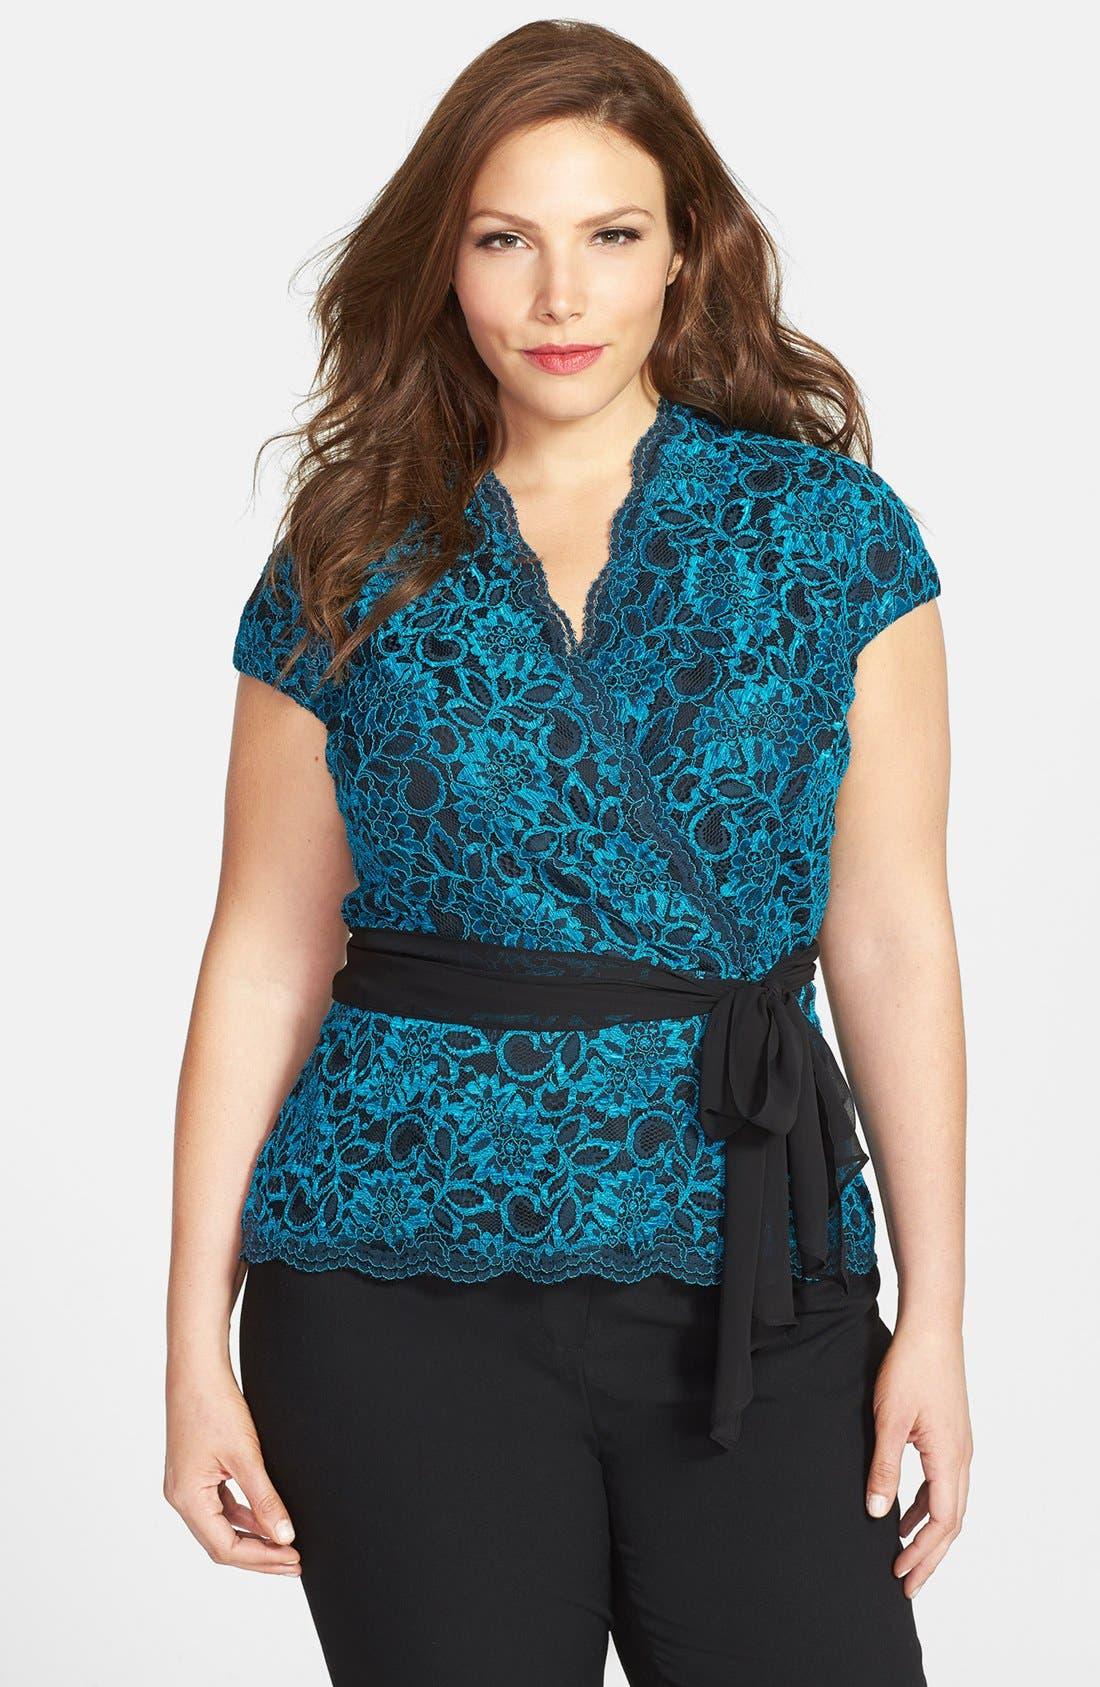 Alternate Image 1 Selected - Alex Evenings Cap Sleeve Surplice Neckline Lace Blouse with Tie Belt (Plus Size)